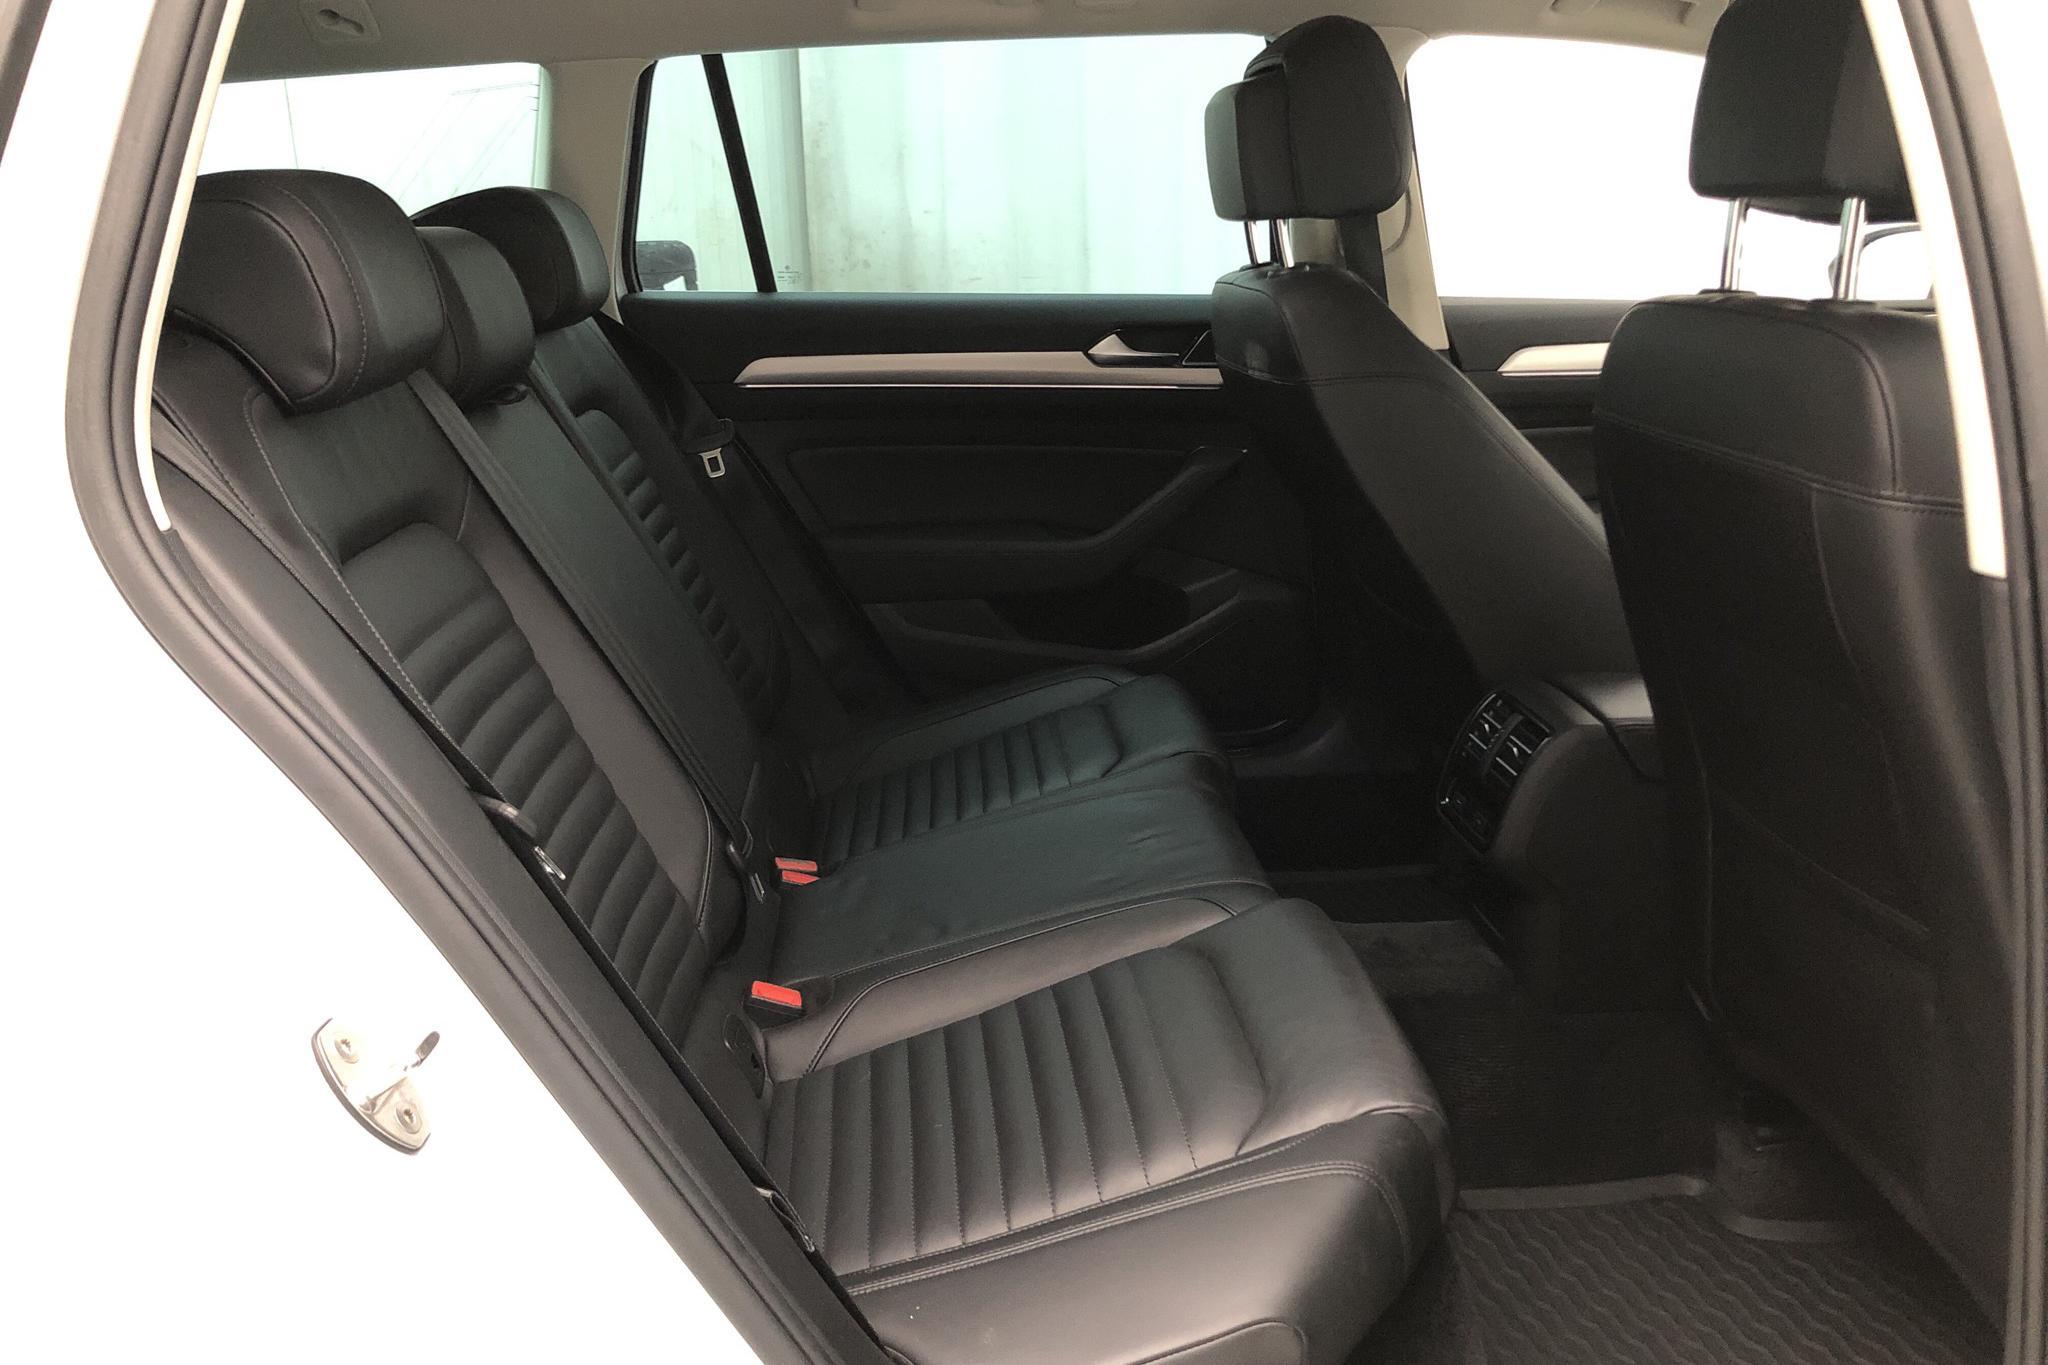 VW Passat Alltrack 2.0 TDI Sportscombi 4MOTION (190hk) - 140 230 km - Automatic - white - 2017